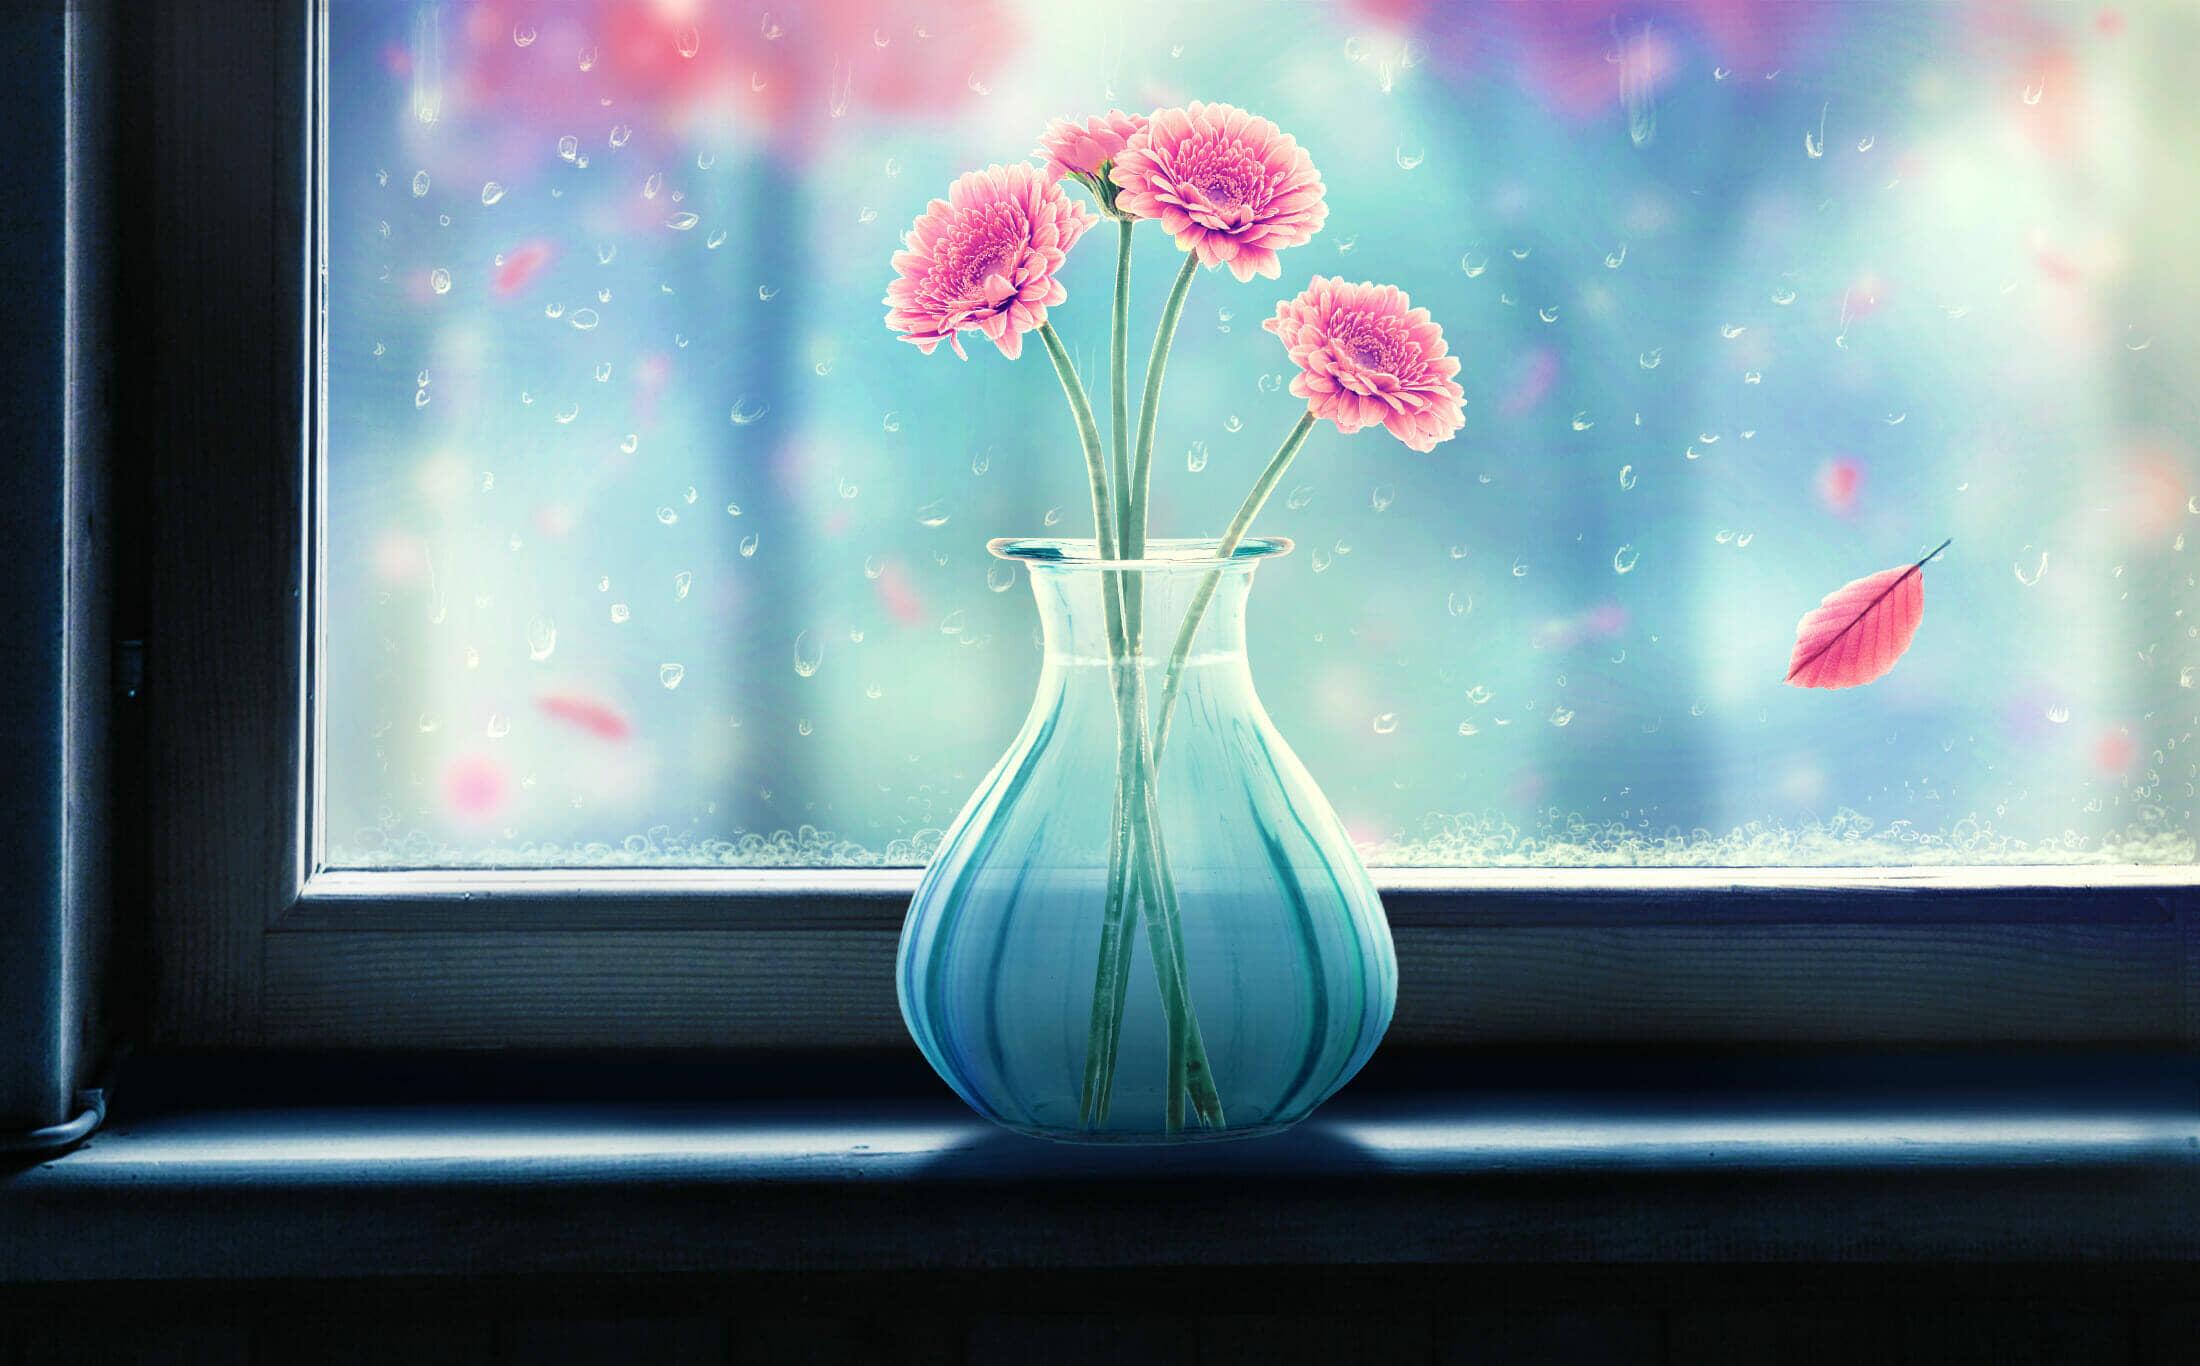 How to Create a Rainy Window Scene with Adobe Photoshop